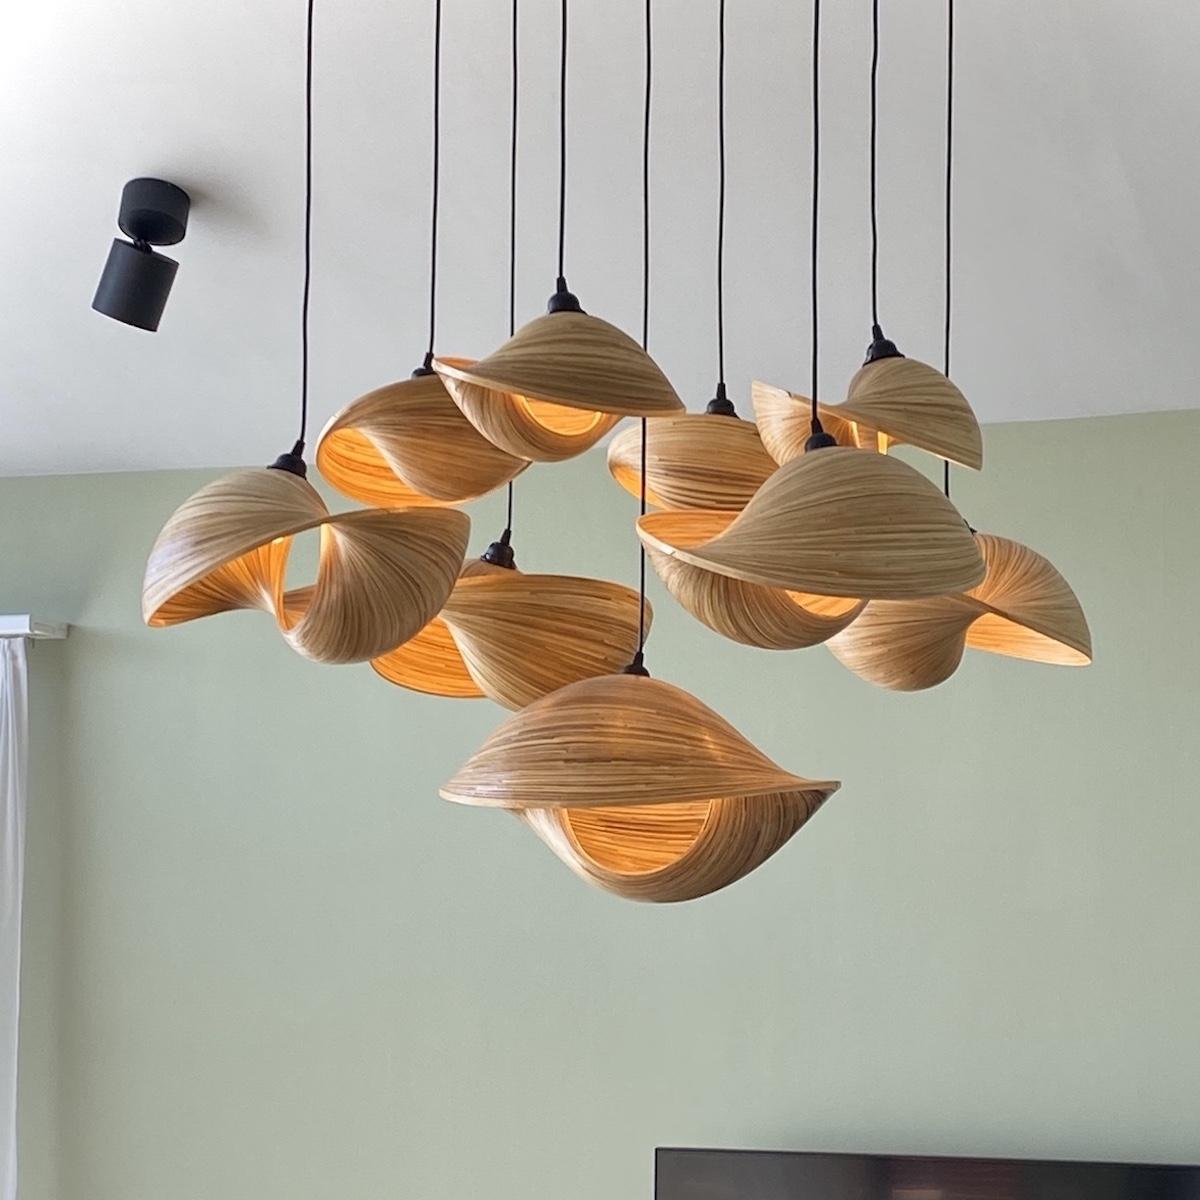 bamboo-chandelier